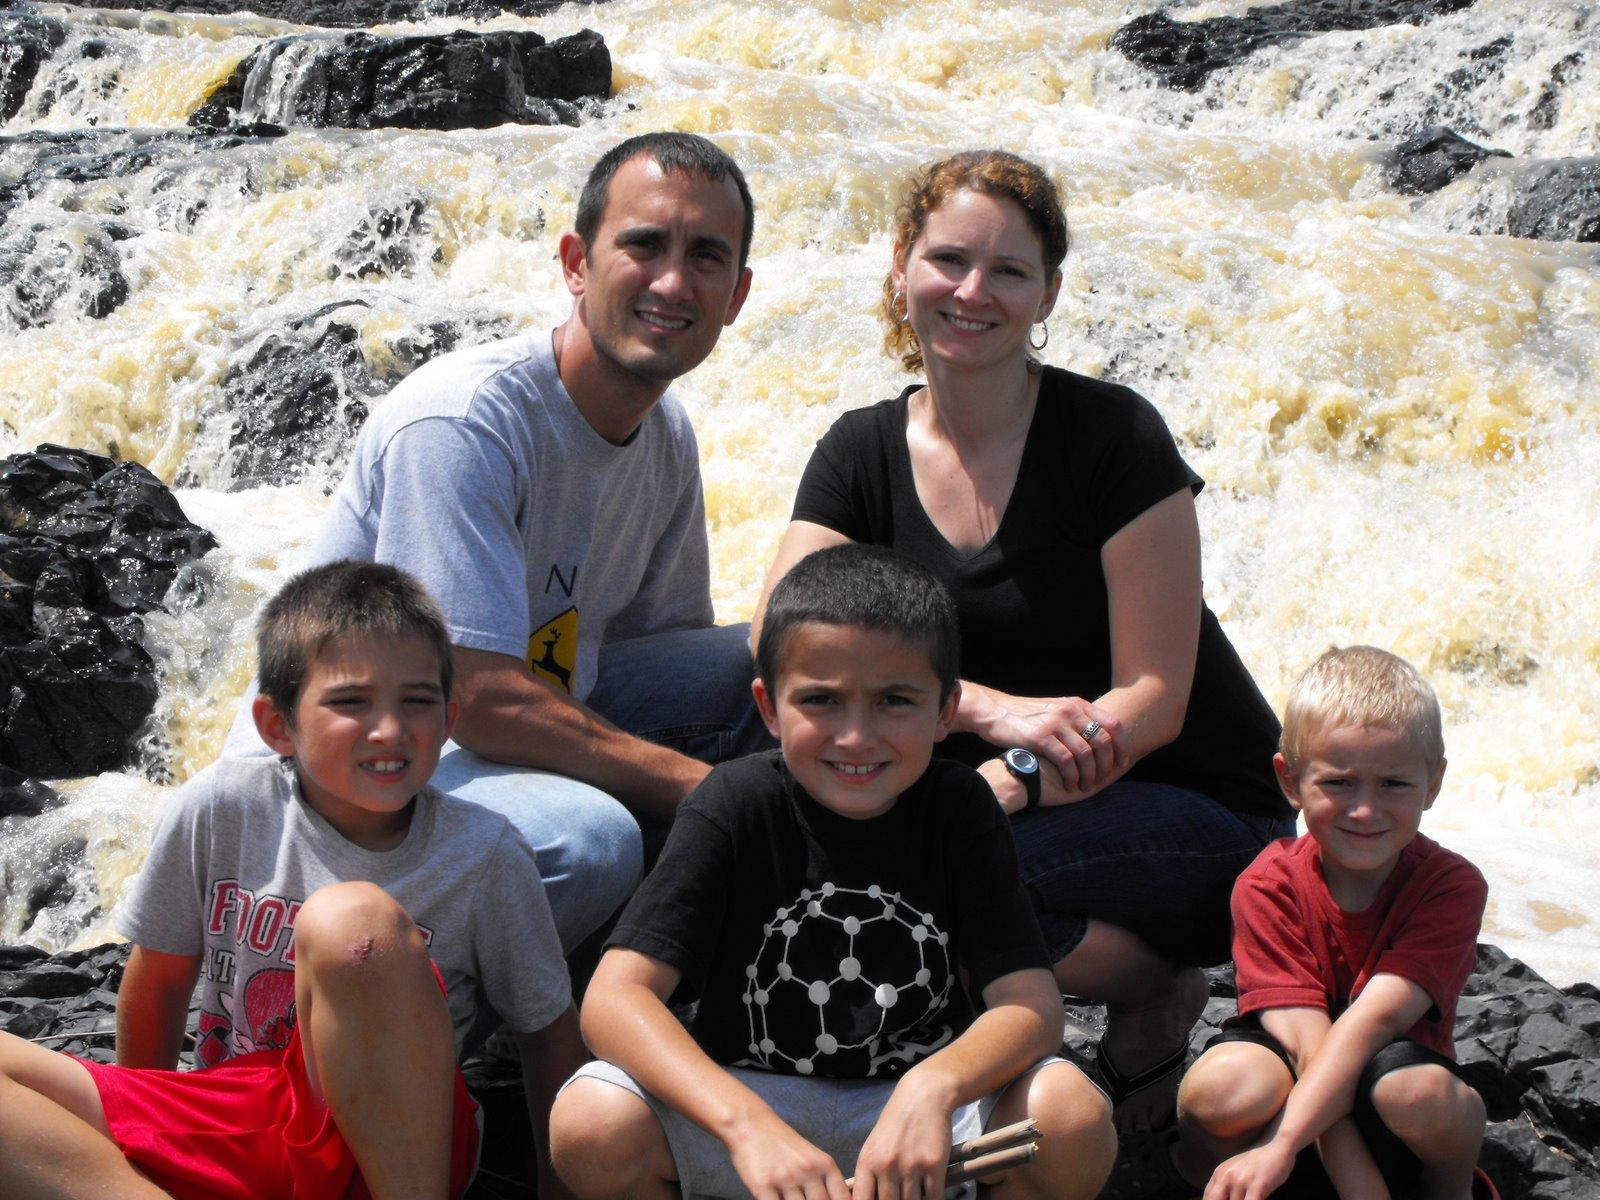 Visiting local waterfalls near B2B Nigeria base   (Top: Chris &  Angela/Bottom L to R: Caleb, Micah & Noah)